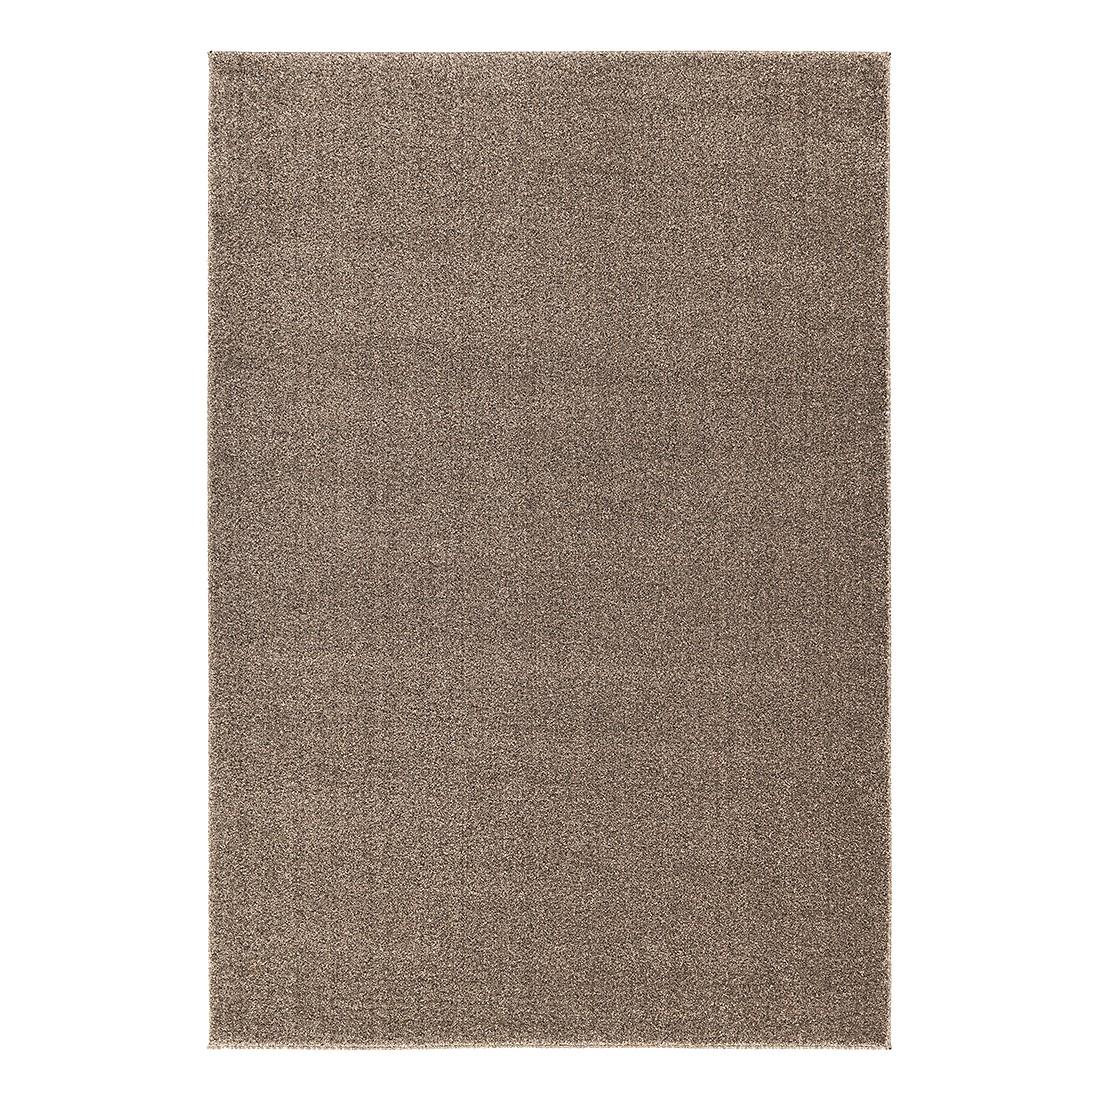 Teppich Samoa I – Erde – 80 x 150 cm, Astra kaufen